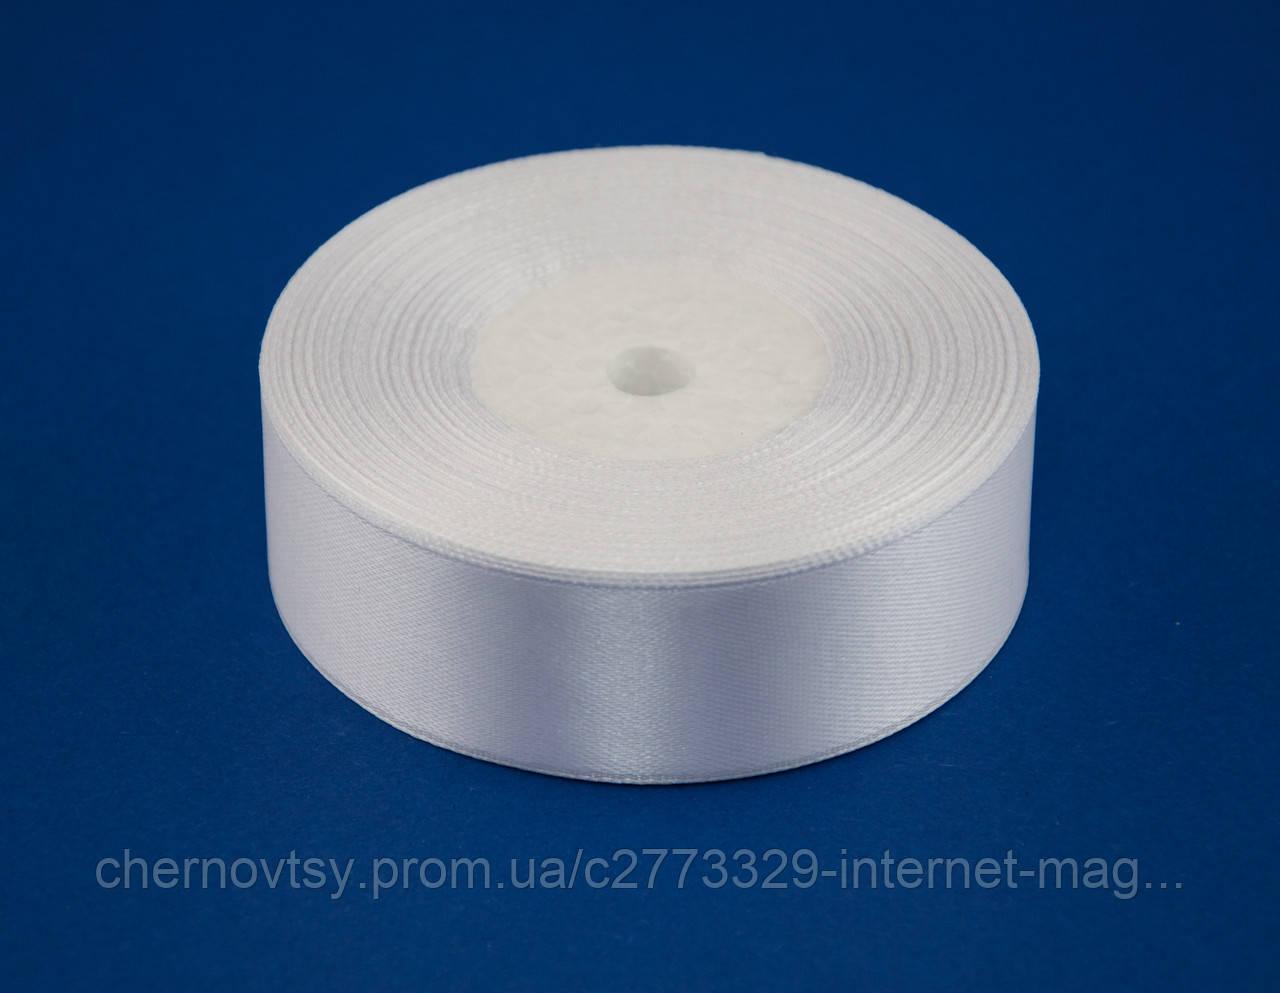 Лента атлас 2.5 см, 33 м, № 01 белая